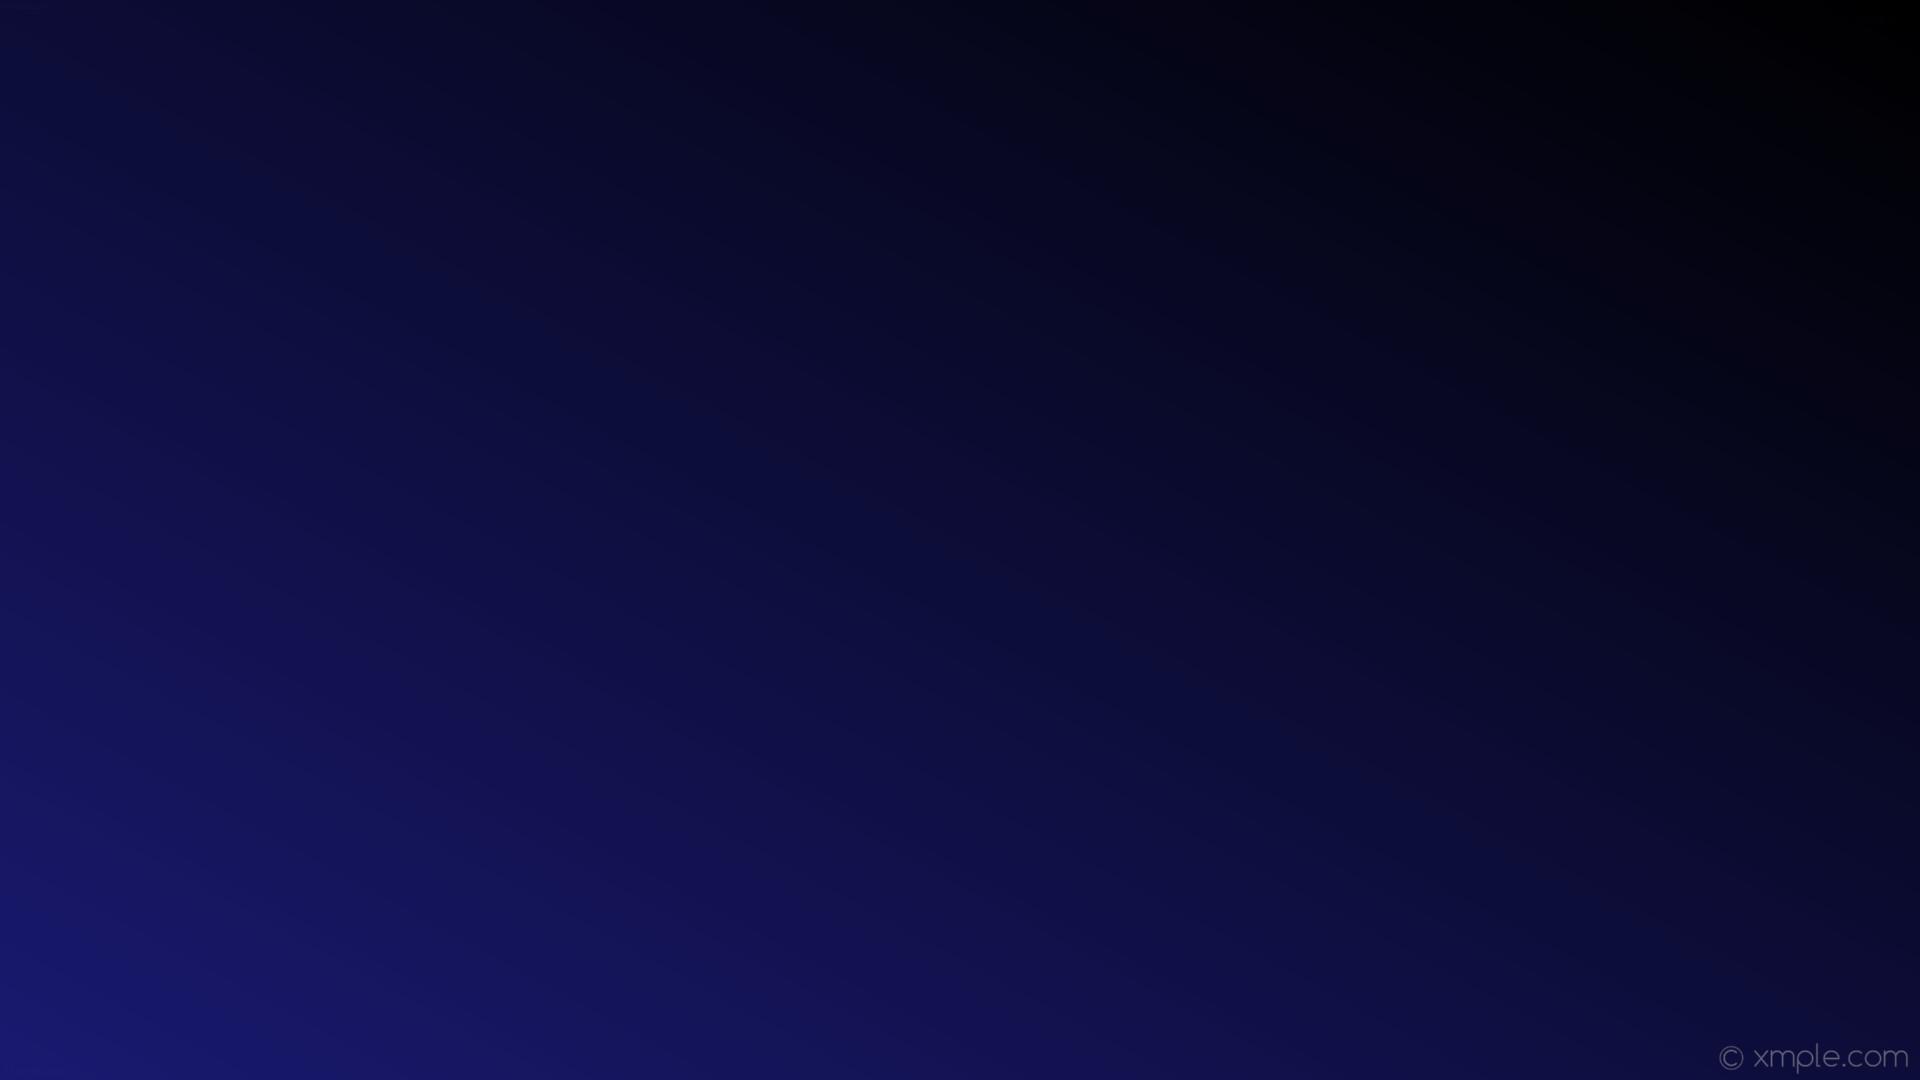 wallpaper black blue gradient linear midnight blue #000000 #191970 30°